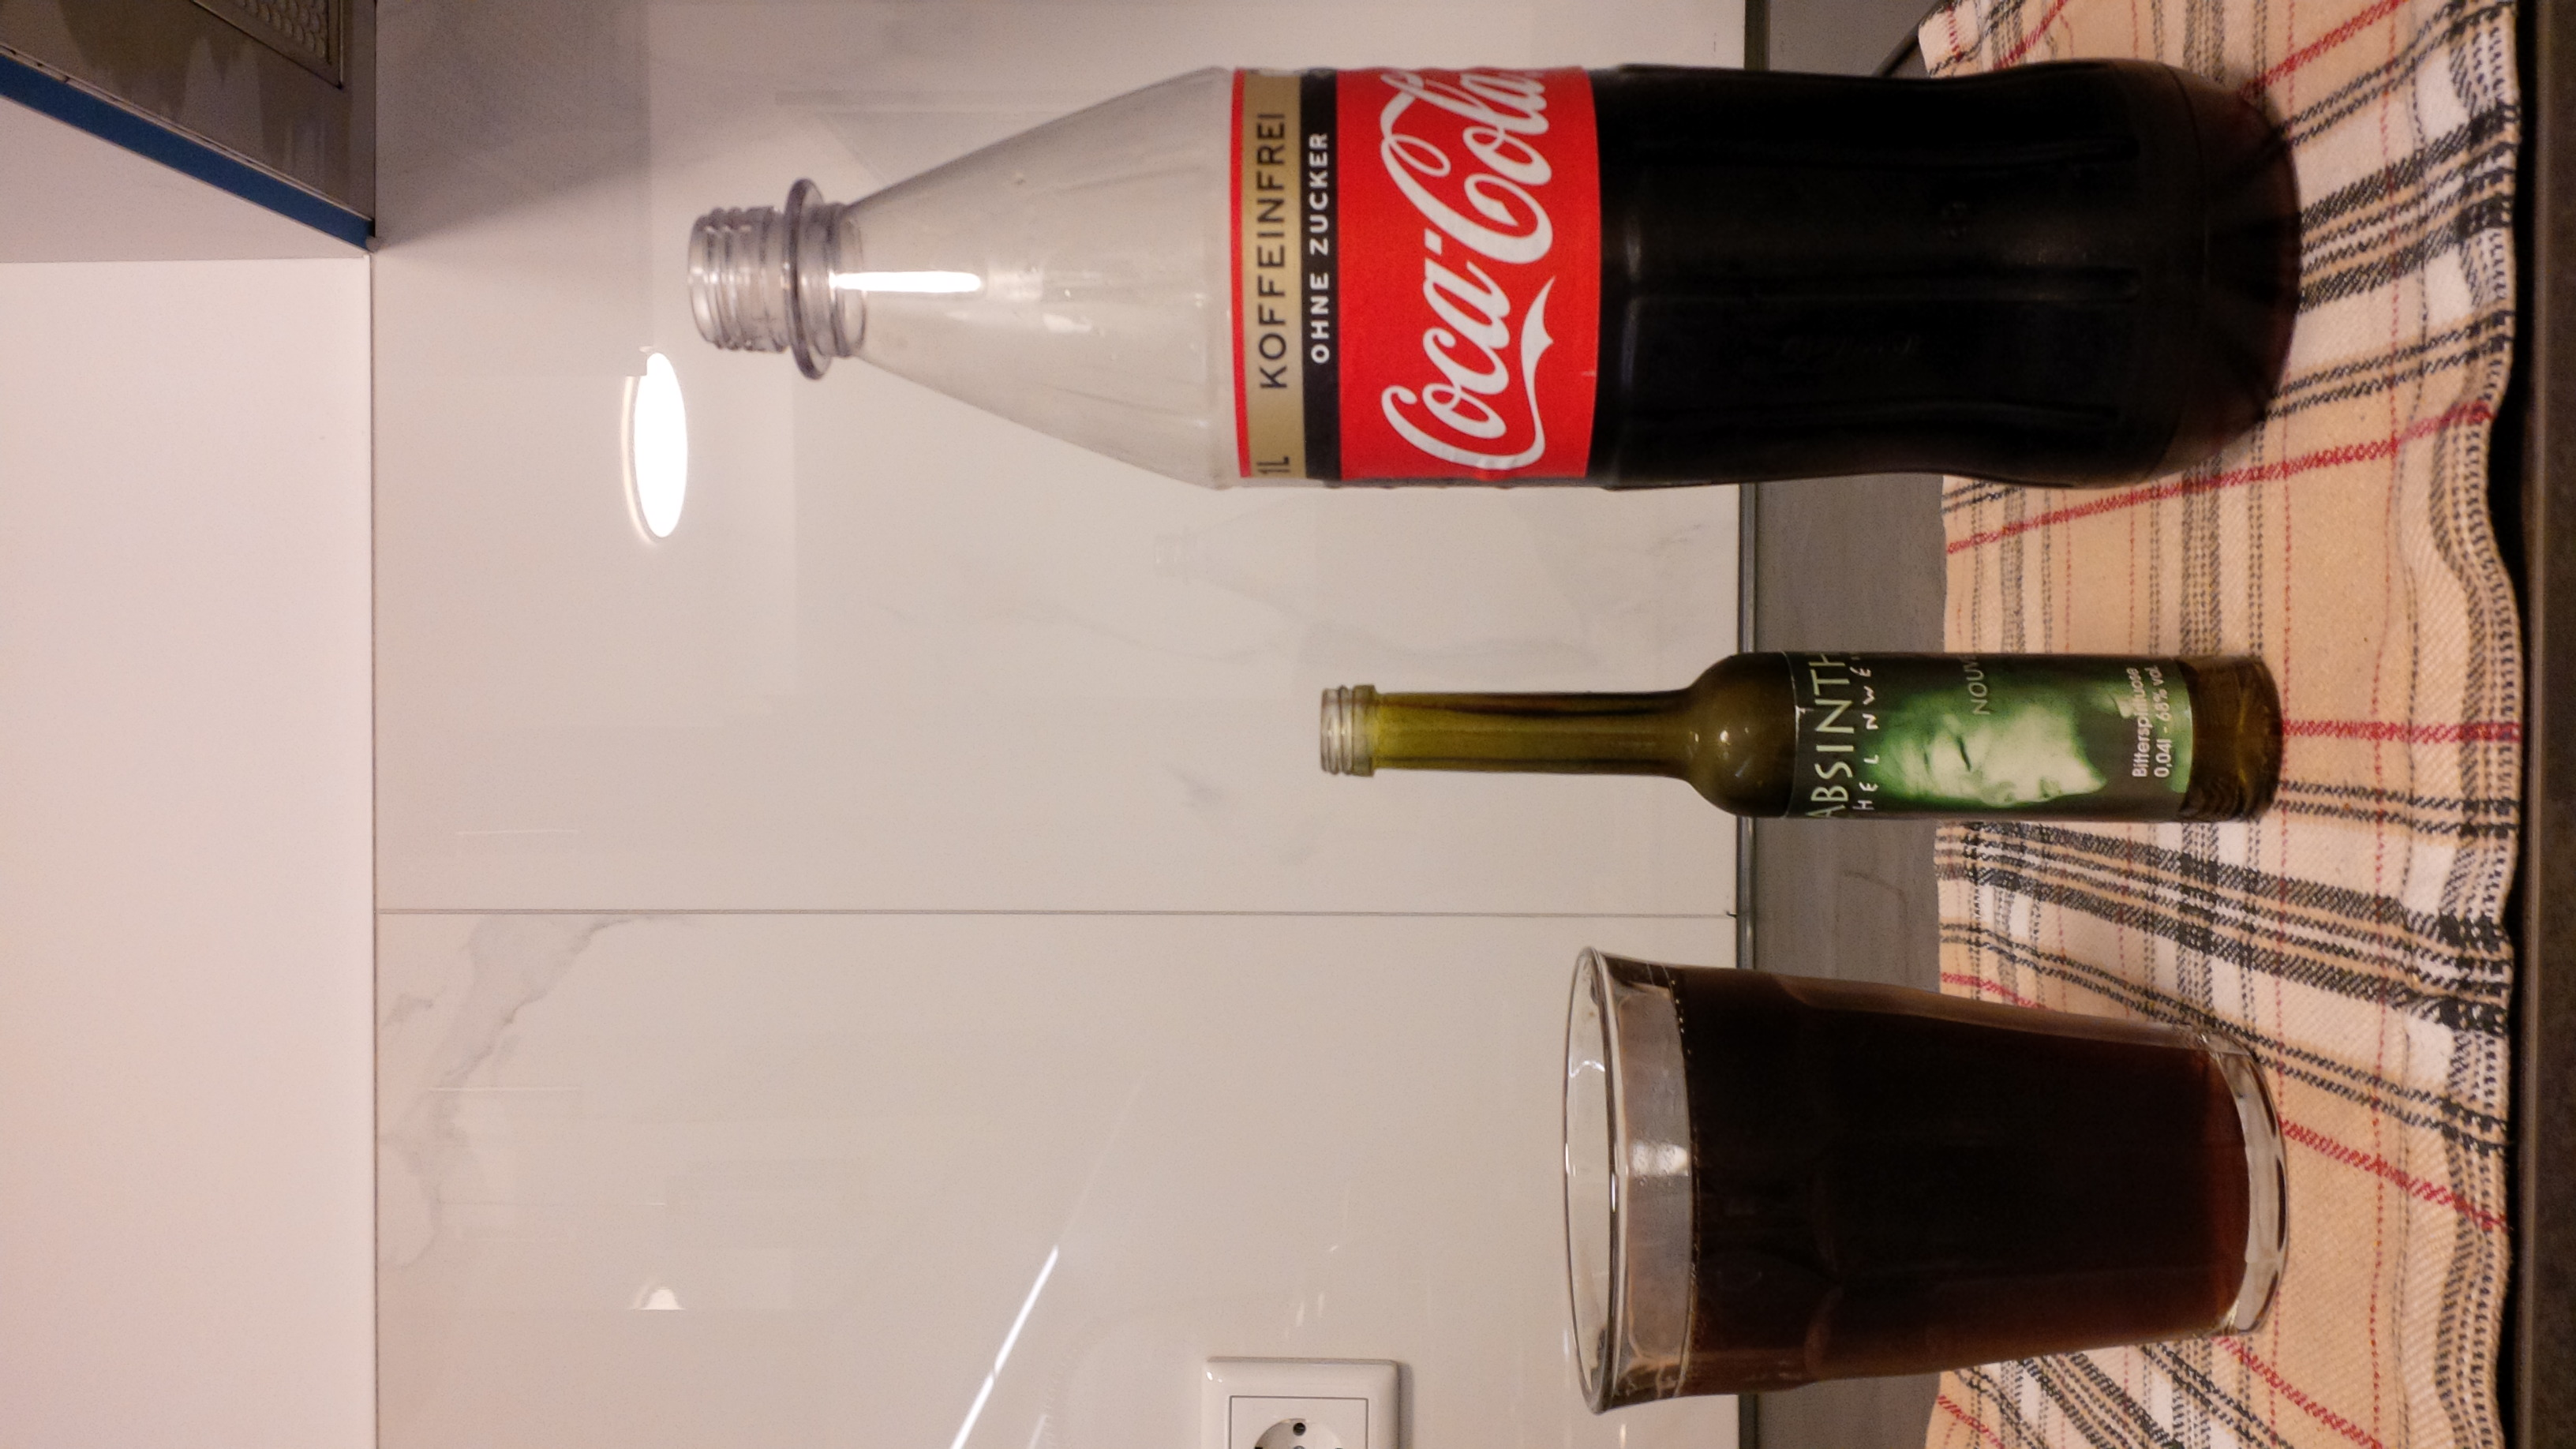 https://foodloader.net/VP_2020-08-21_Absinth-Cola.jpg